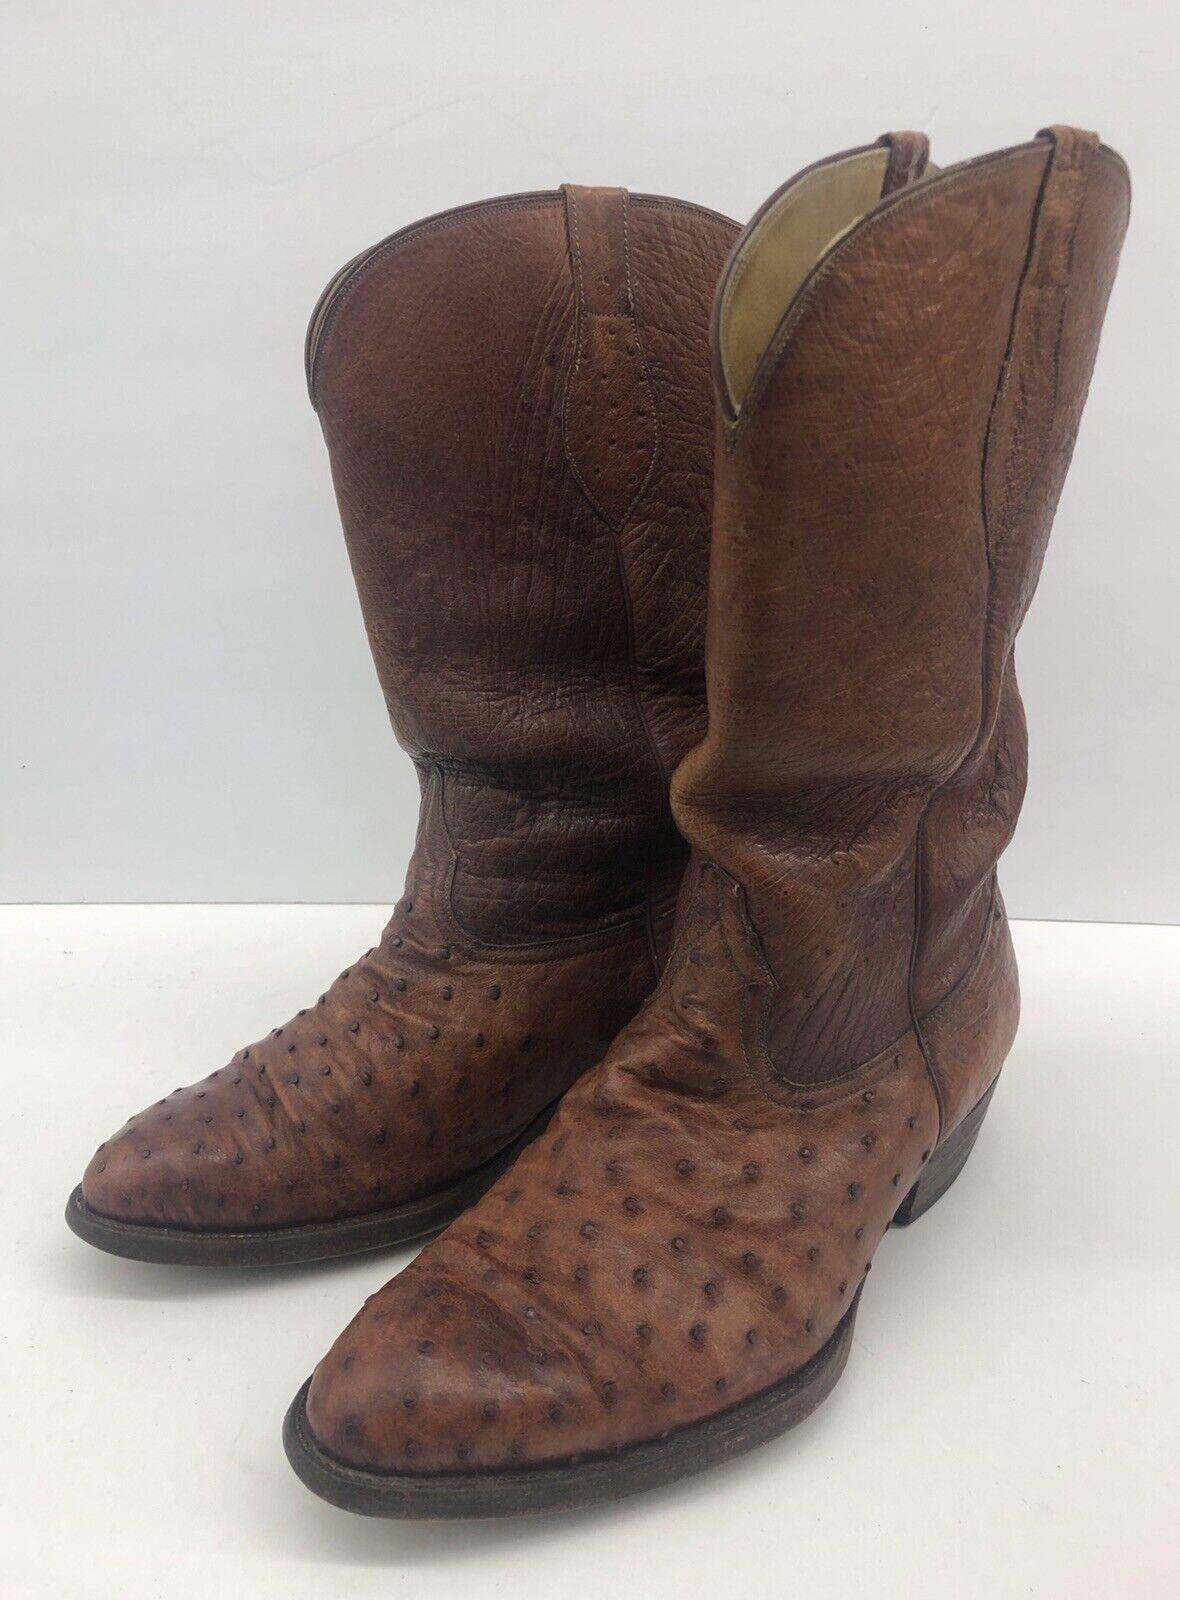 Gallegos Mendez Santa Fe Nuevo México Avestruz Pluma botas Hombre de ancho